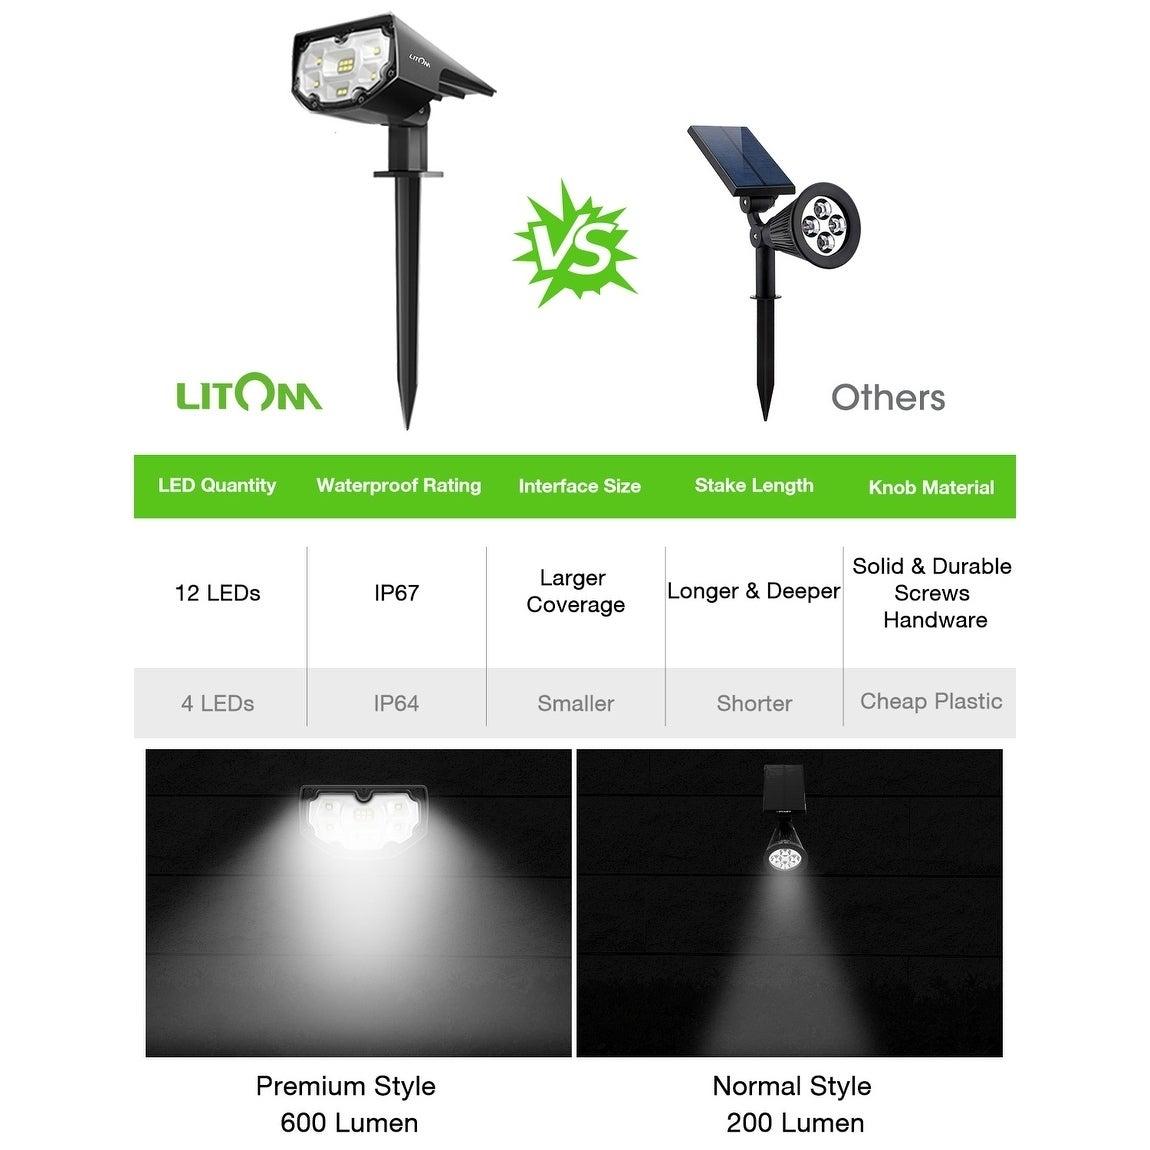 Litom 12LED Outdoor Solar Spot Light Garden Walkway Porch Pathway Lawn Lamp IPX7